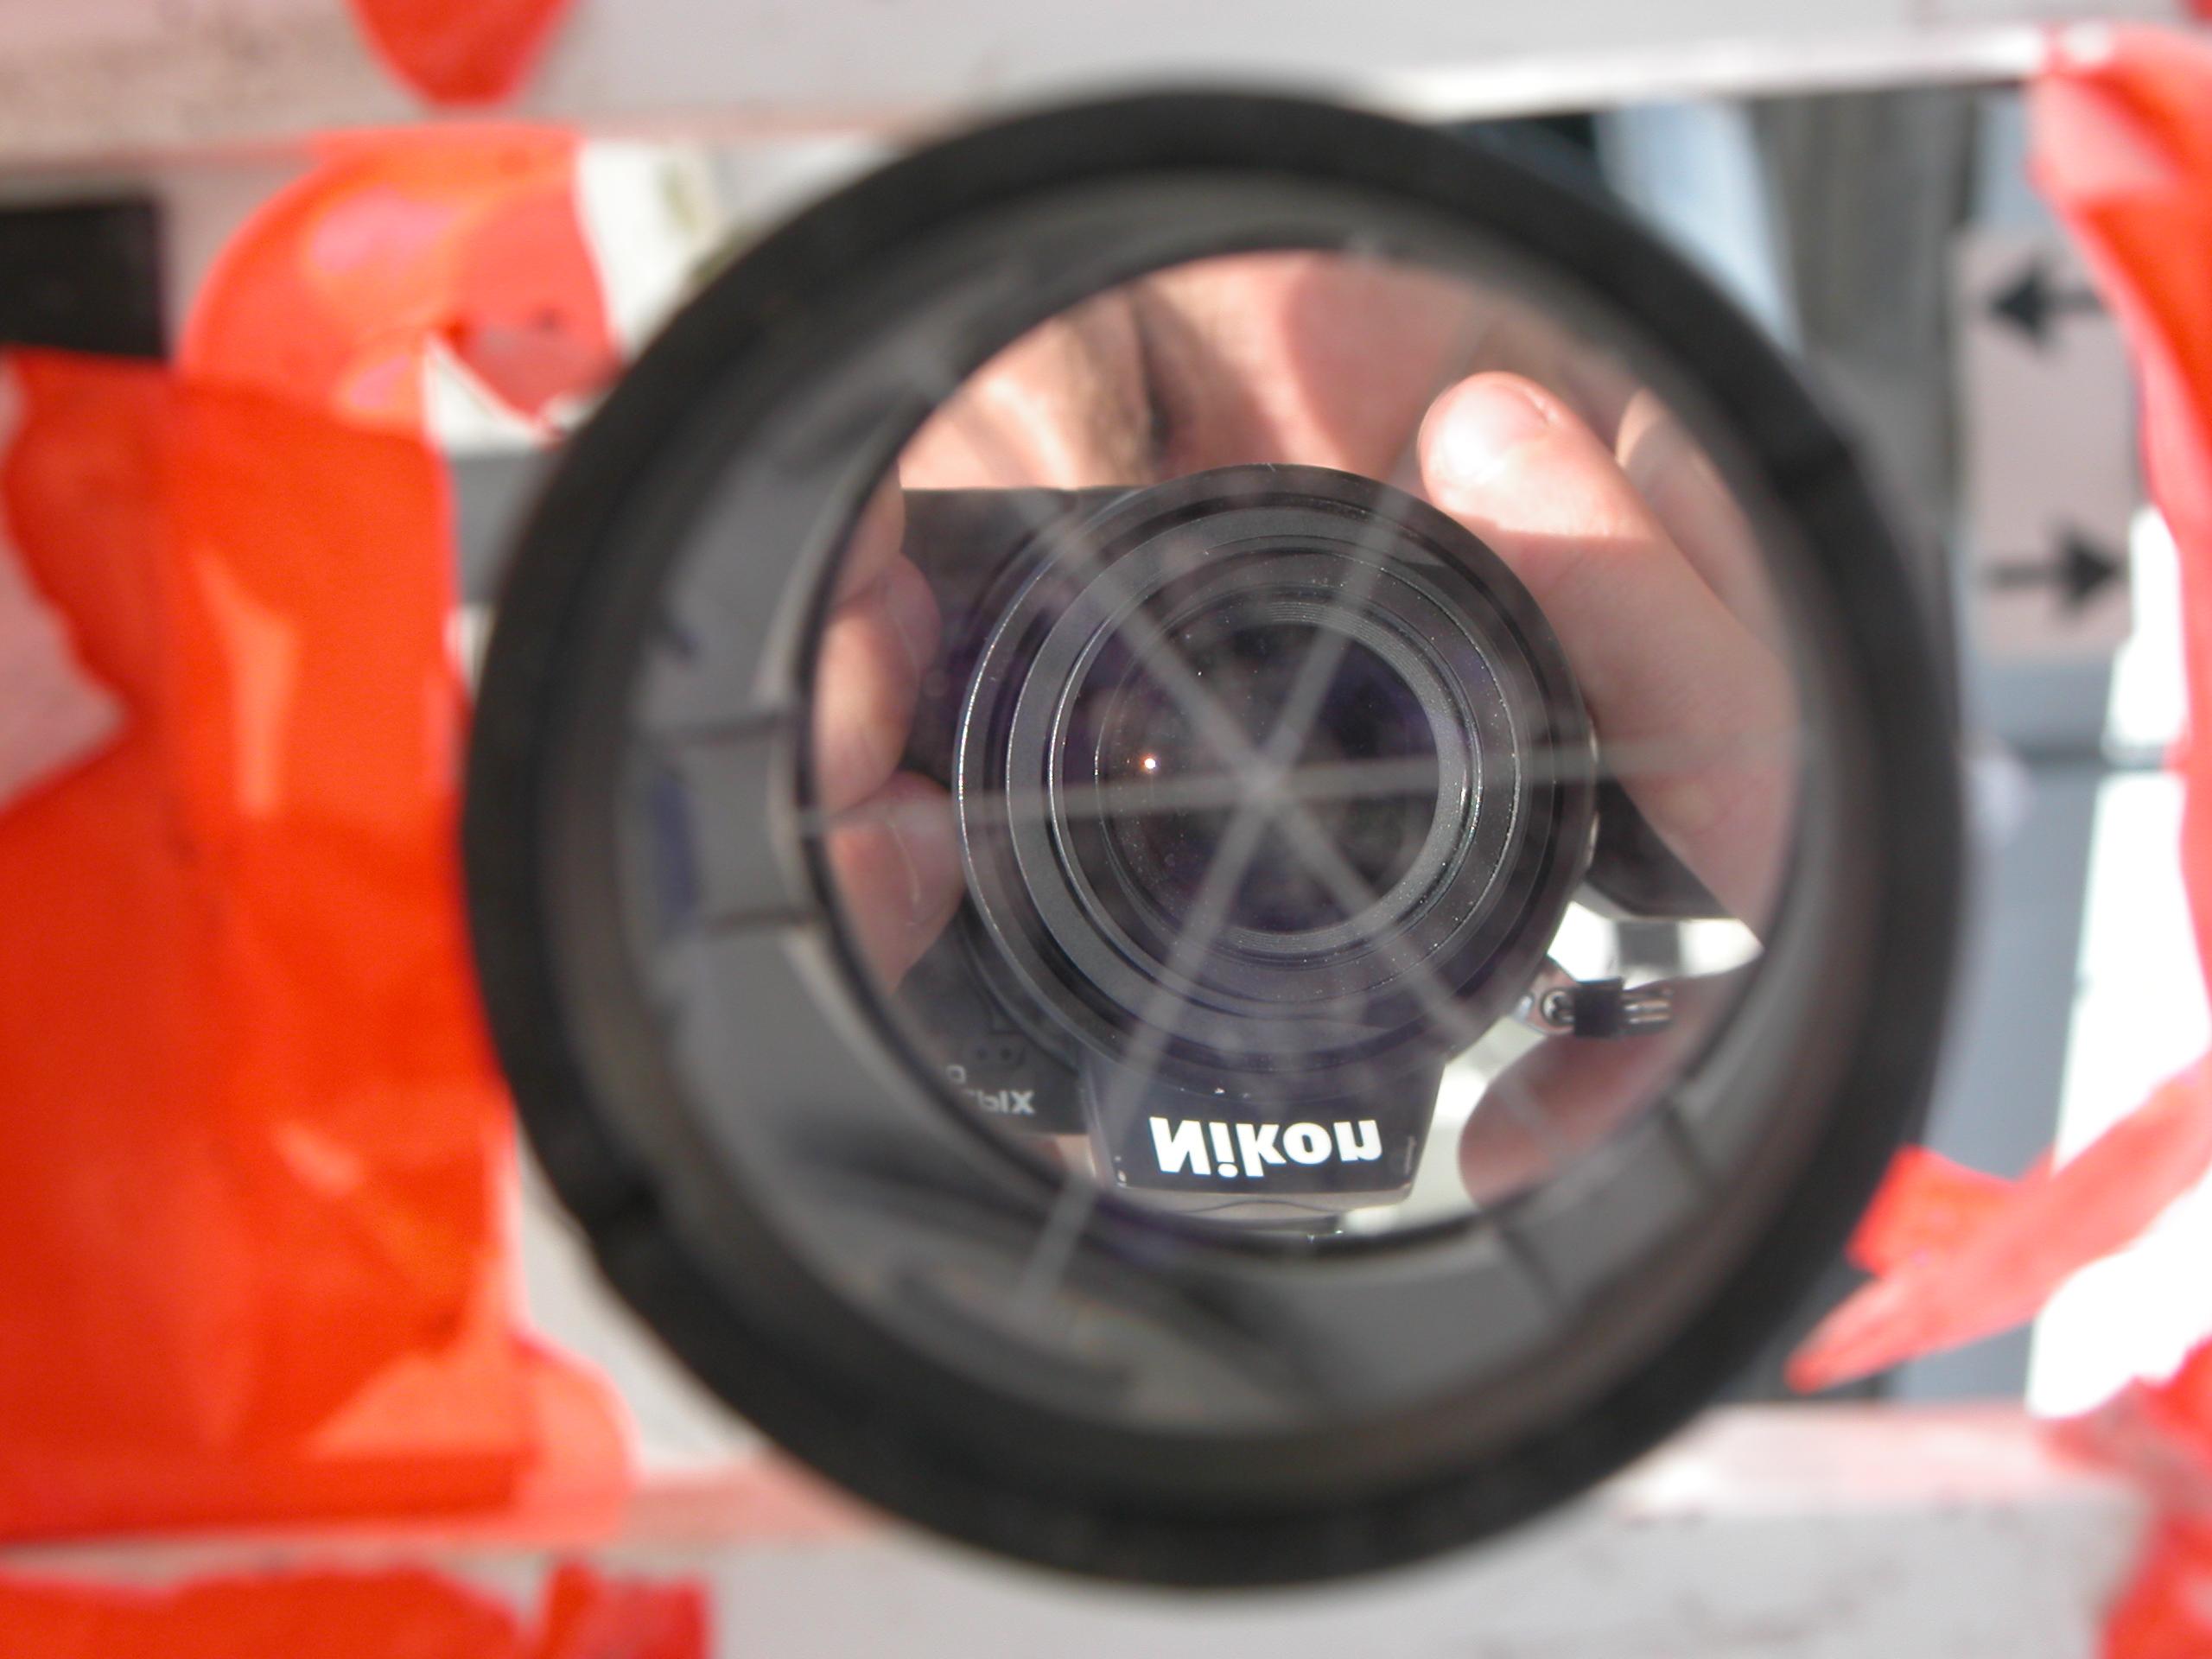 nikon camera in reflection in mirror